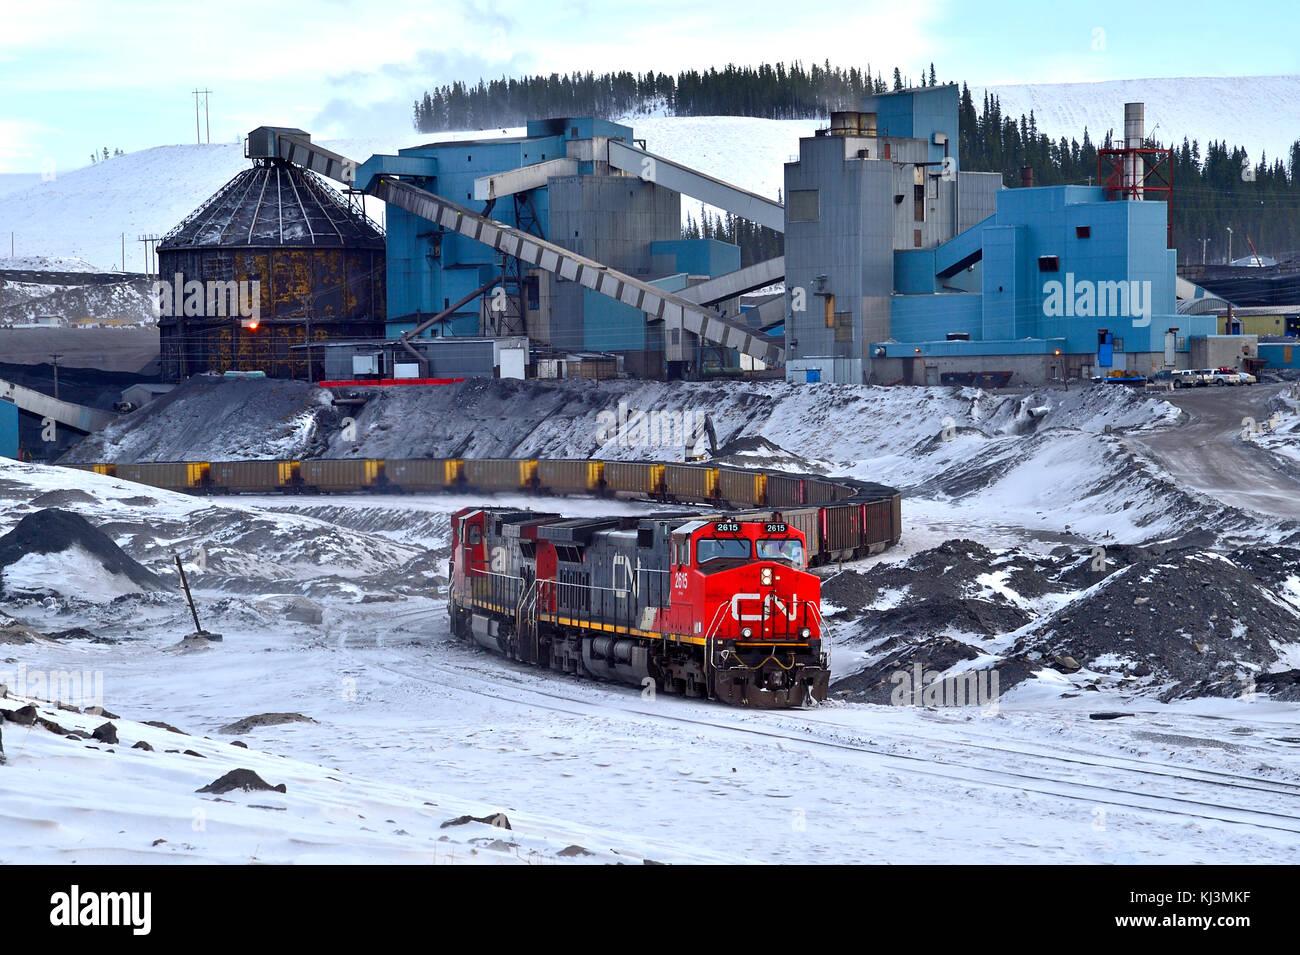 coal train mine stockfotos coal train mine bilder alamy. Black Bedroom Furniture Sets. Home Design Ideas